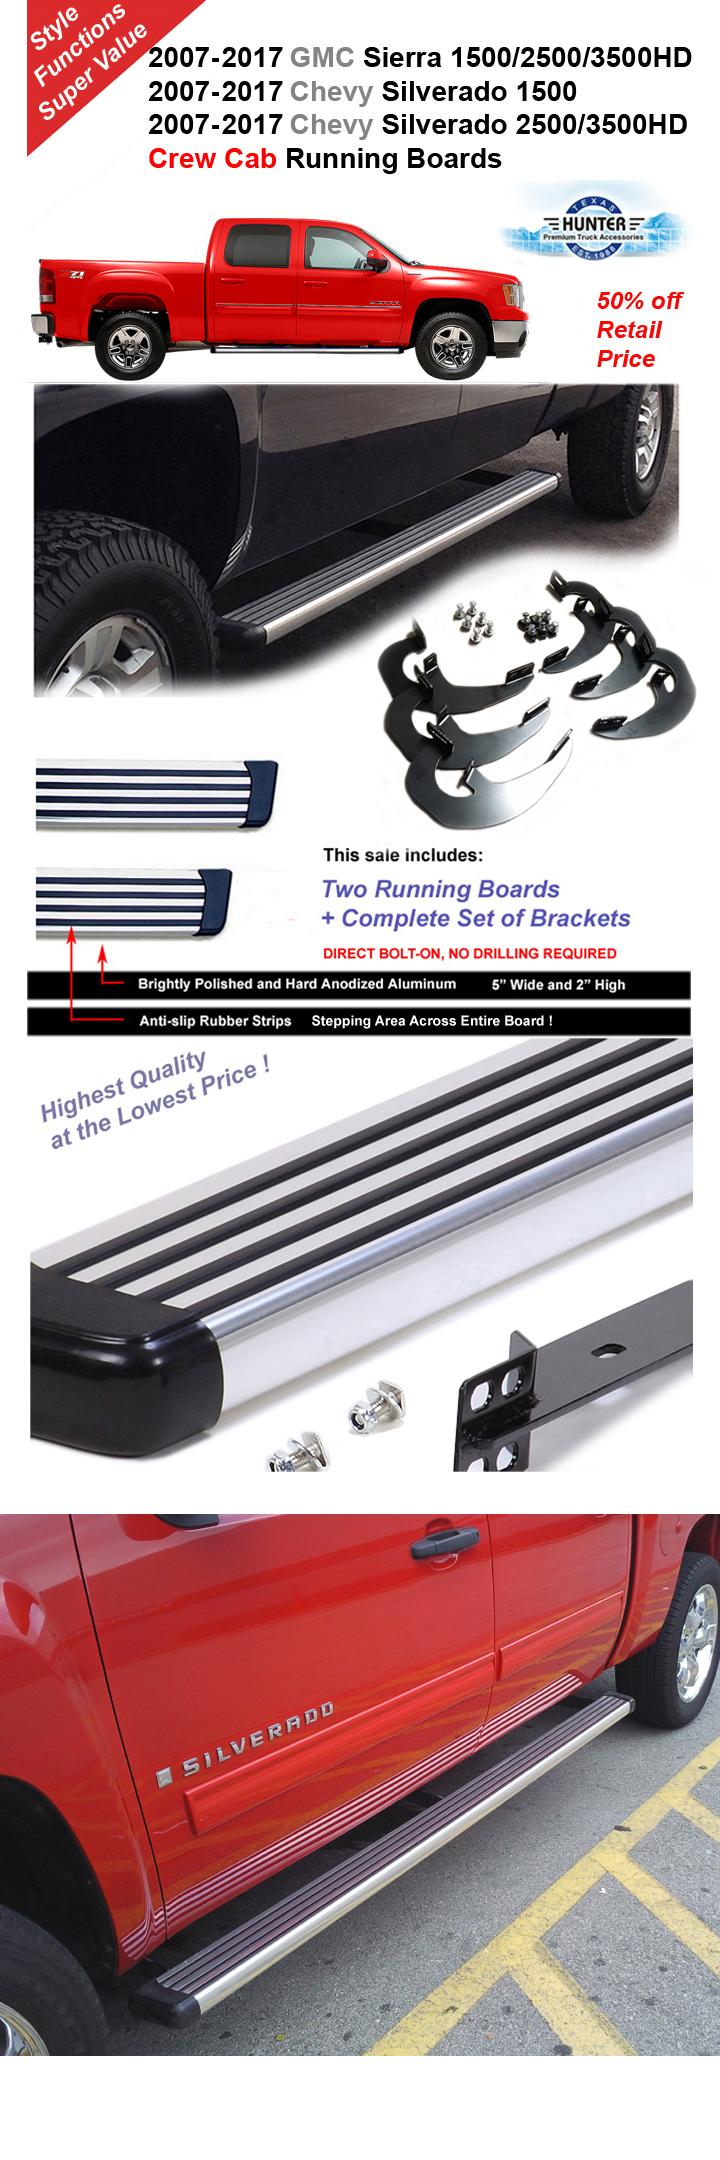 2007 2017 silverado sierra 1500 2500 3500hd crew cab. Black Bedroom Furniture Sets. Home Design Ideas